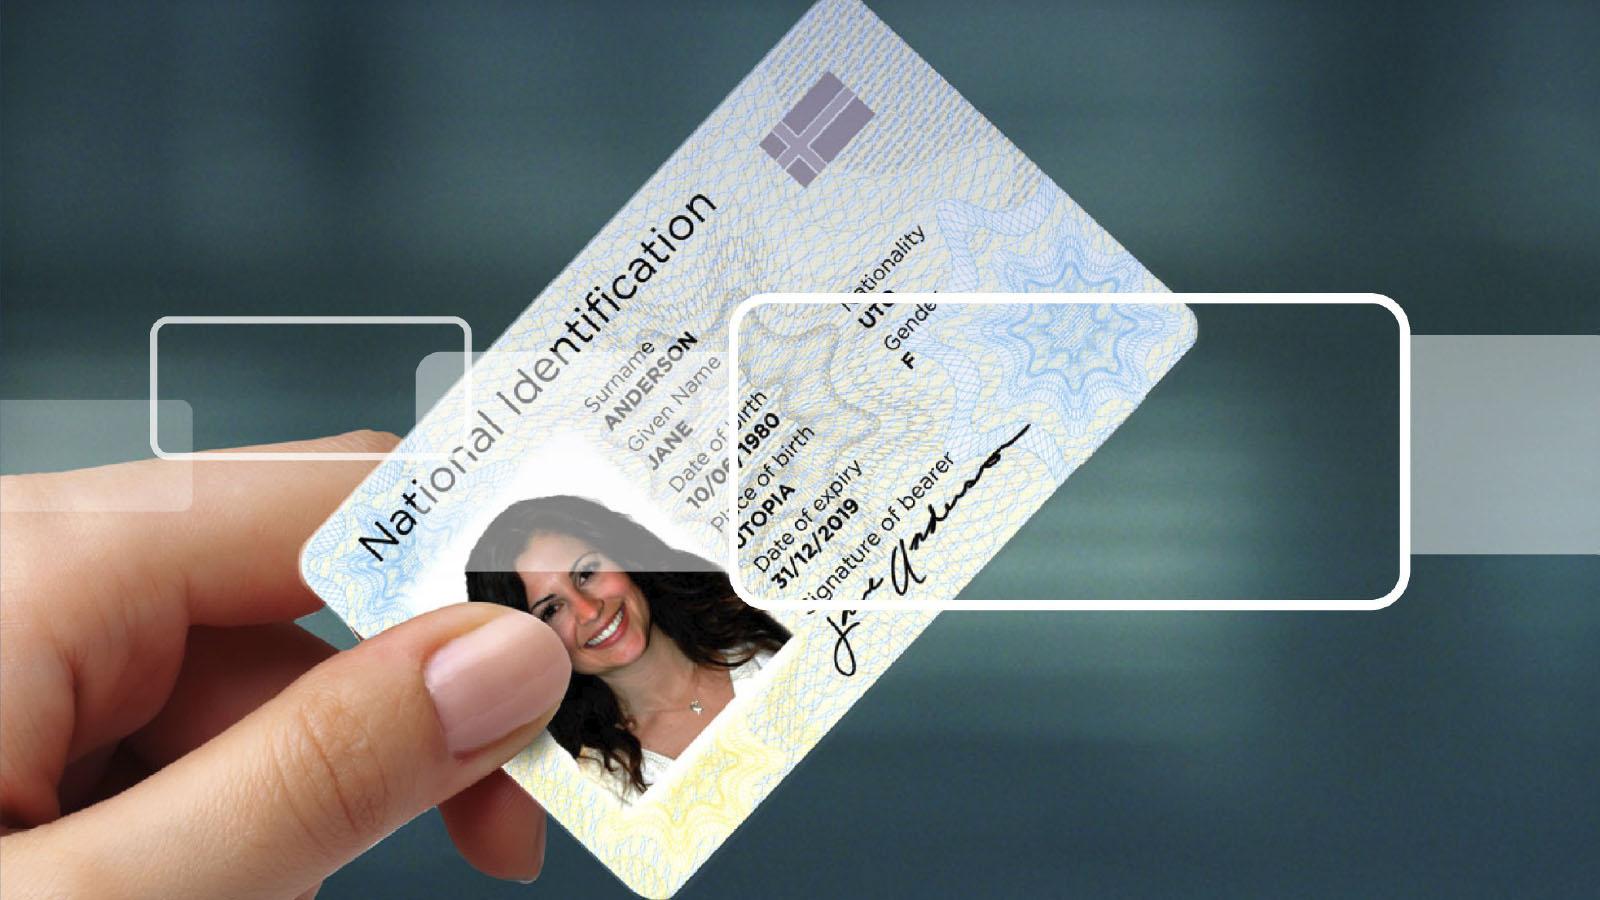 Fargo ID Card Printers Visual Security